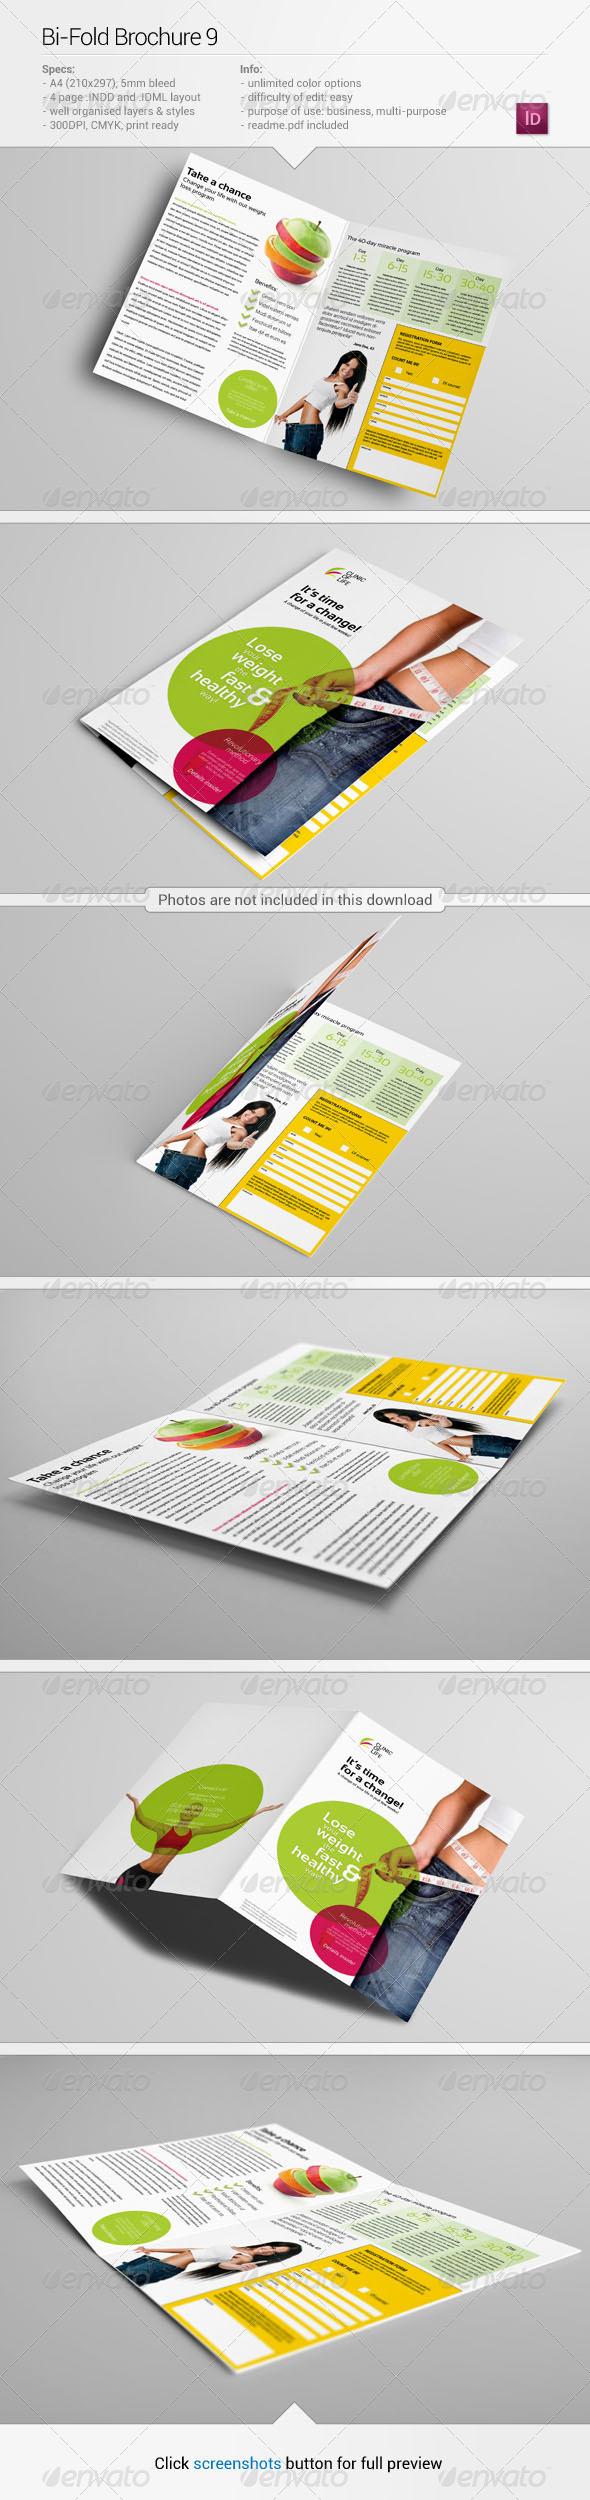 Bi-Fold Brochure 9 - Informational Brochures